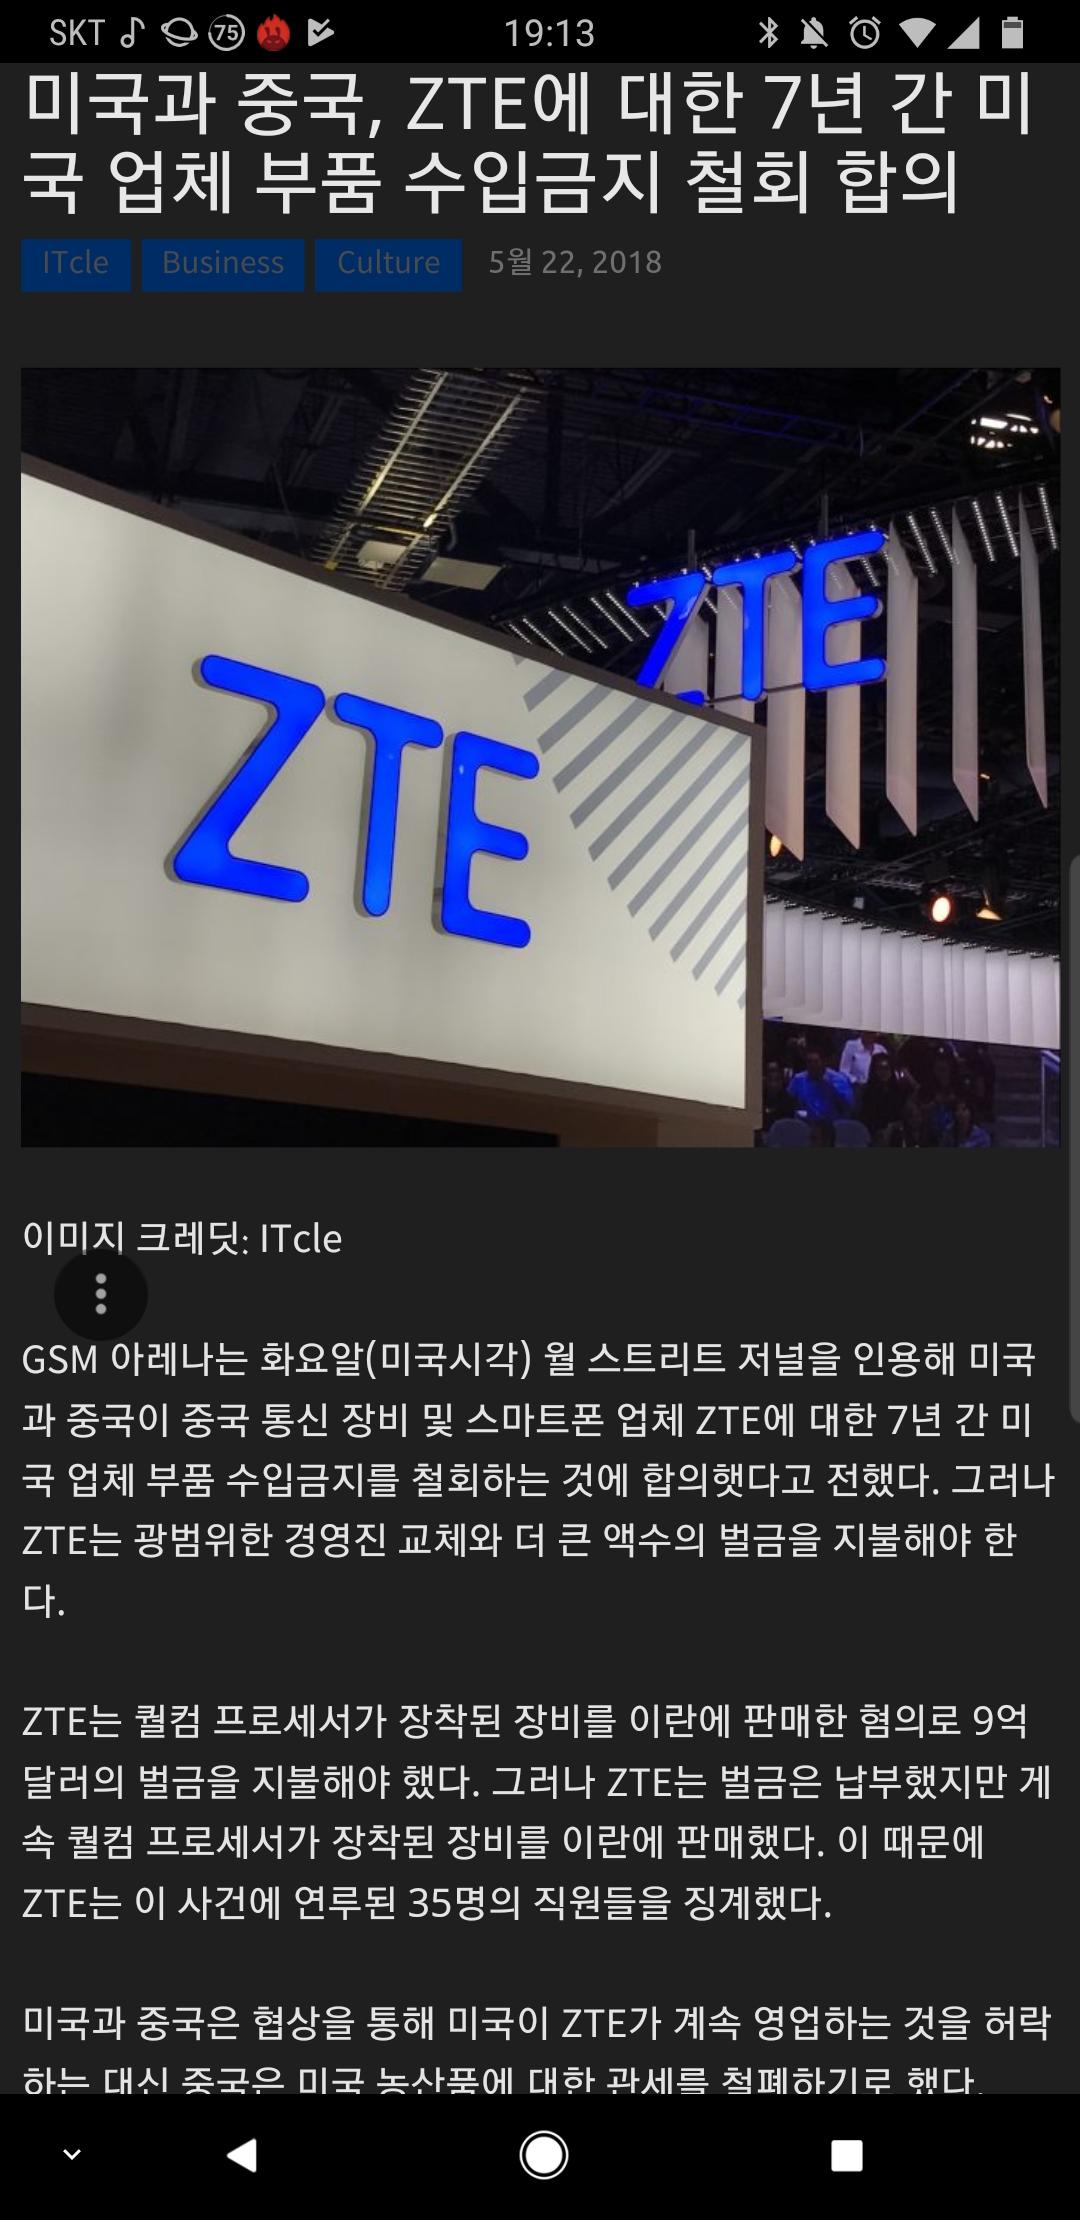 Screenshot_20180522-191341_Samsung Internet.jpg